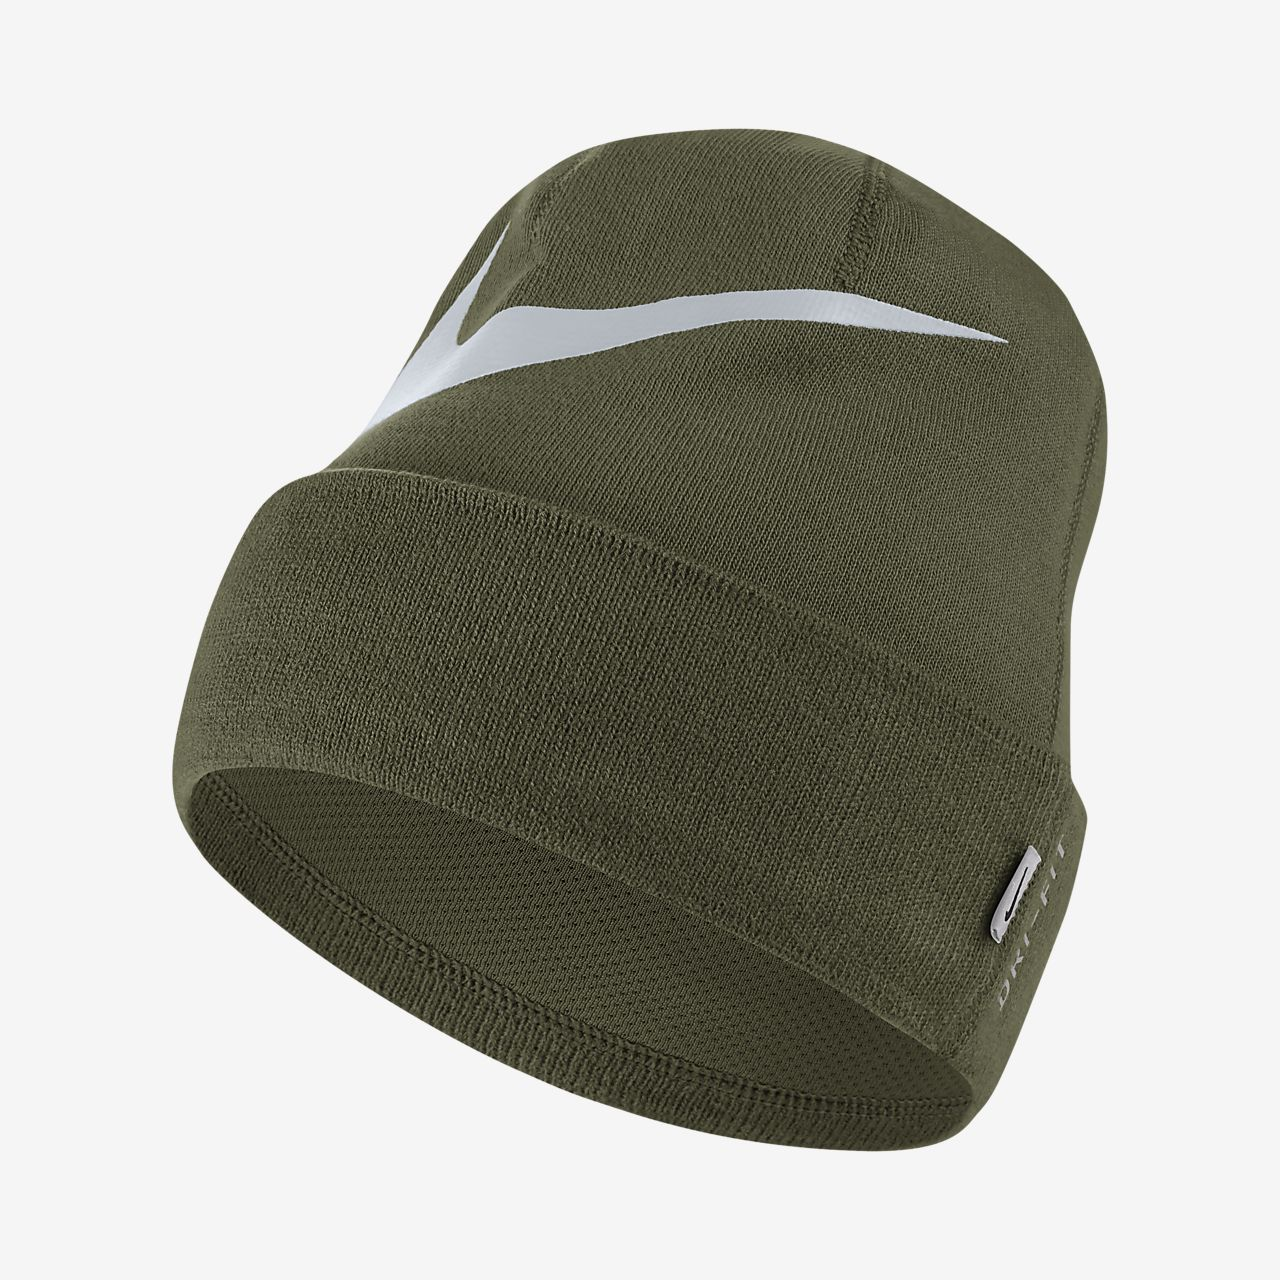 82bf5a5b51 Bonnet de training en maille Nike Swoosh Cuffed. Nike.com FR